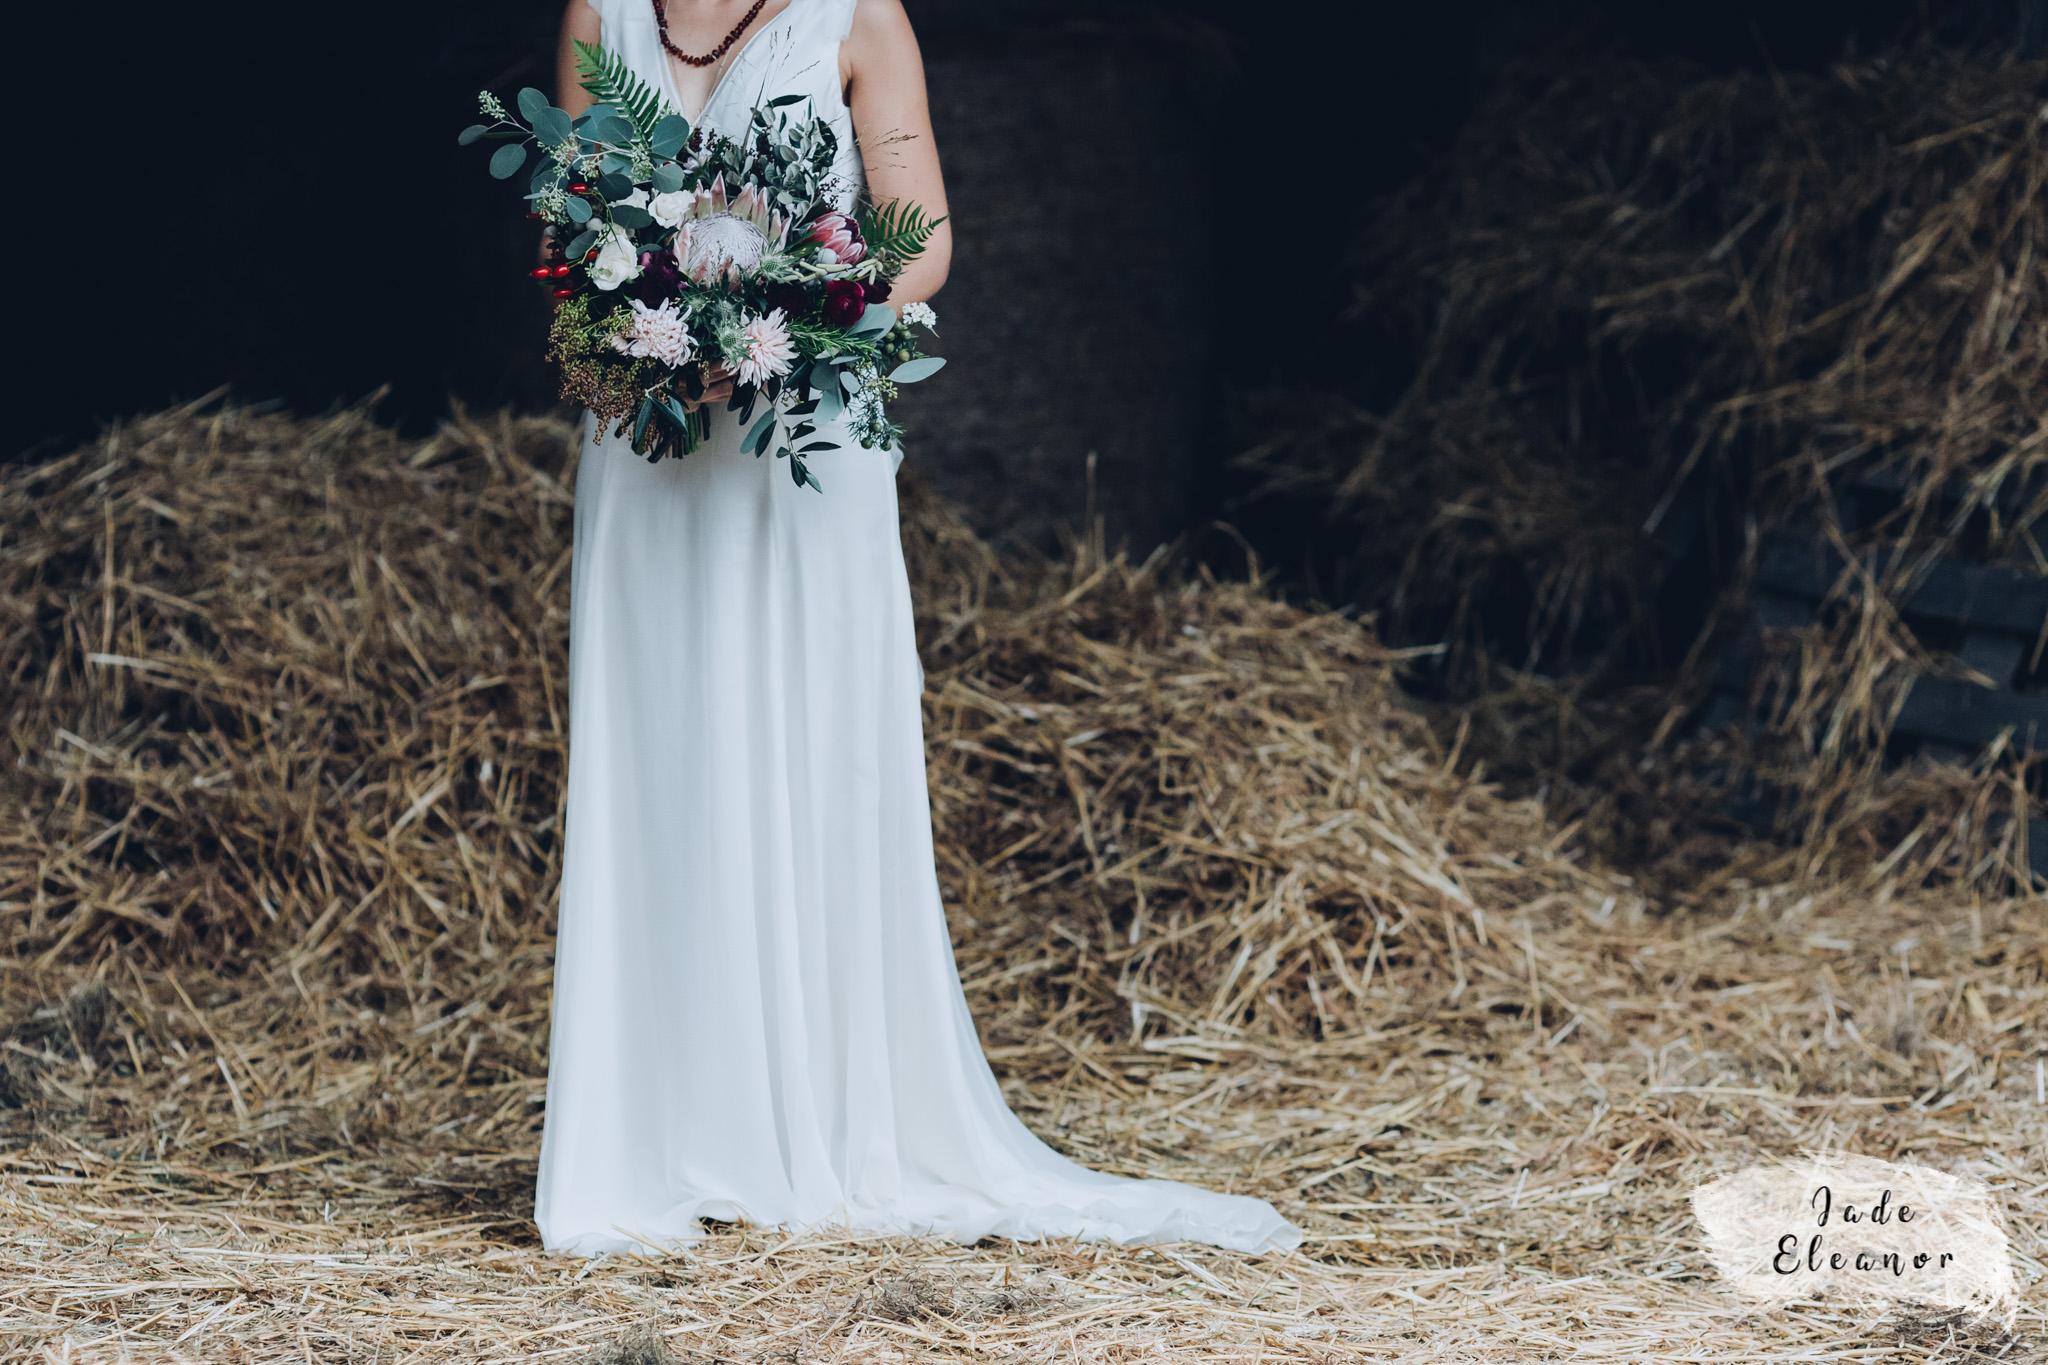 Bysshe Court Barn Wedding Jade Eleanor Photography-21.jpg